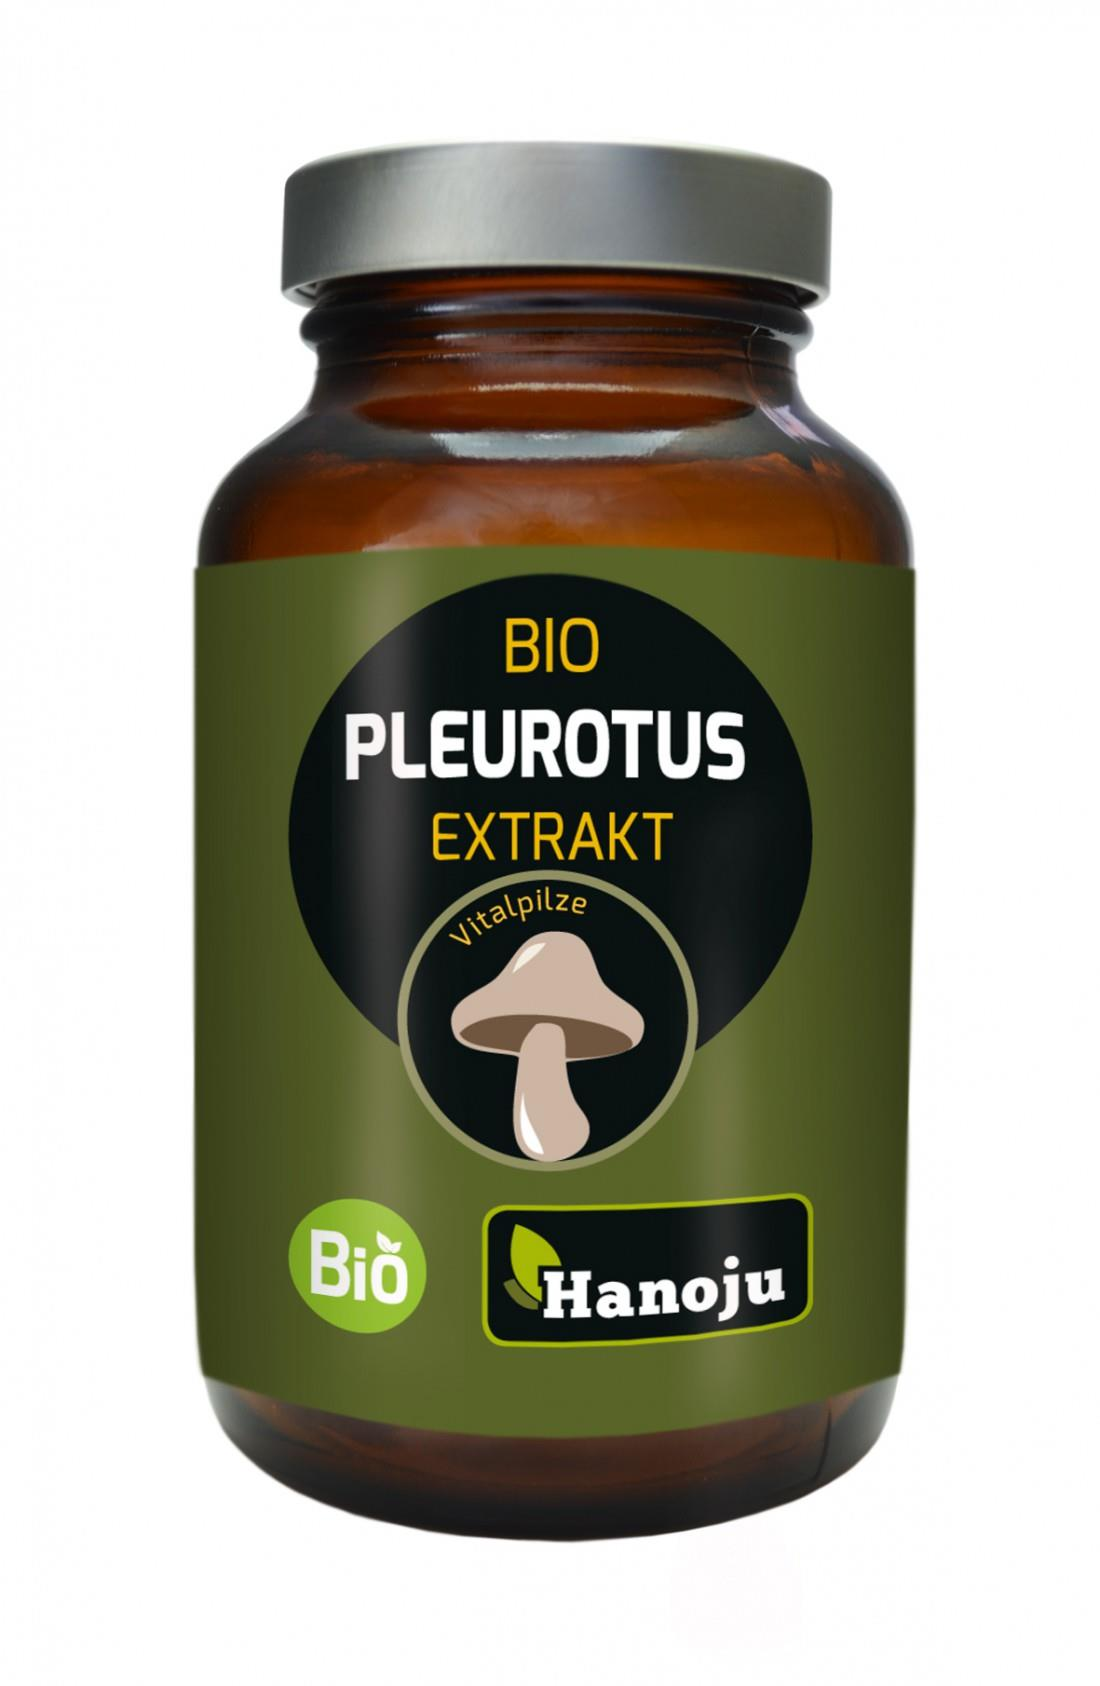 Bio Pleurotus Extrakt Kapseln Hanoju